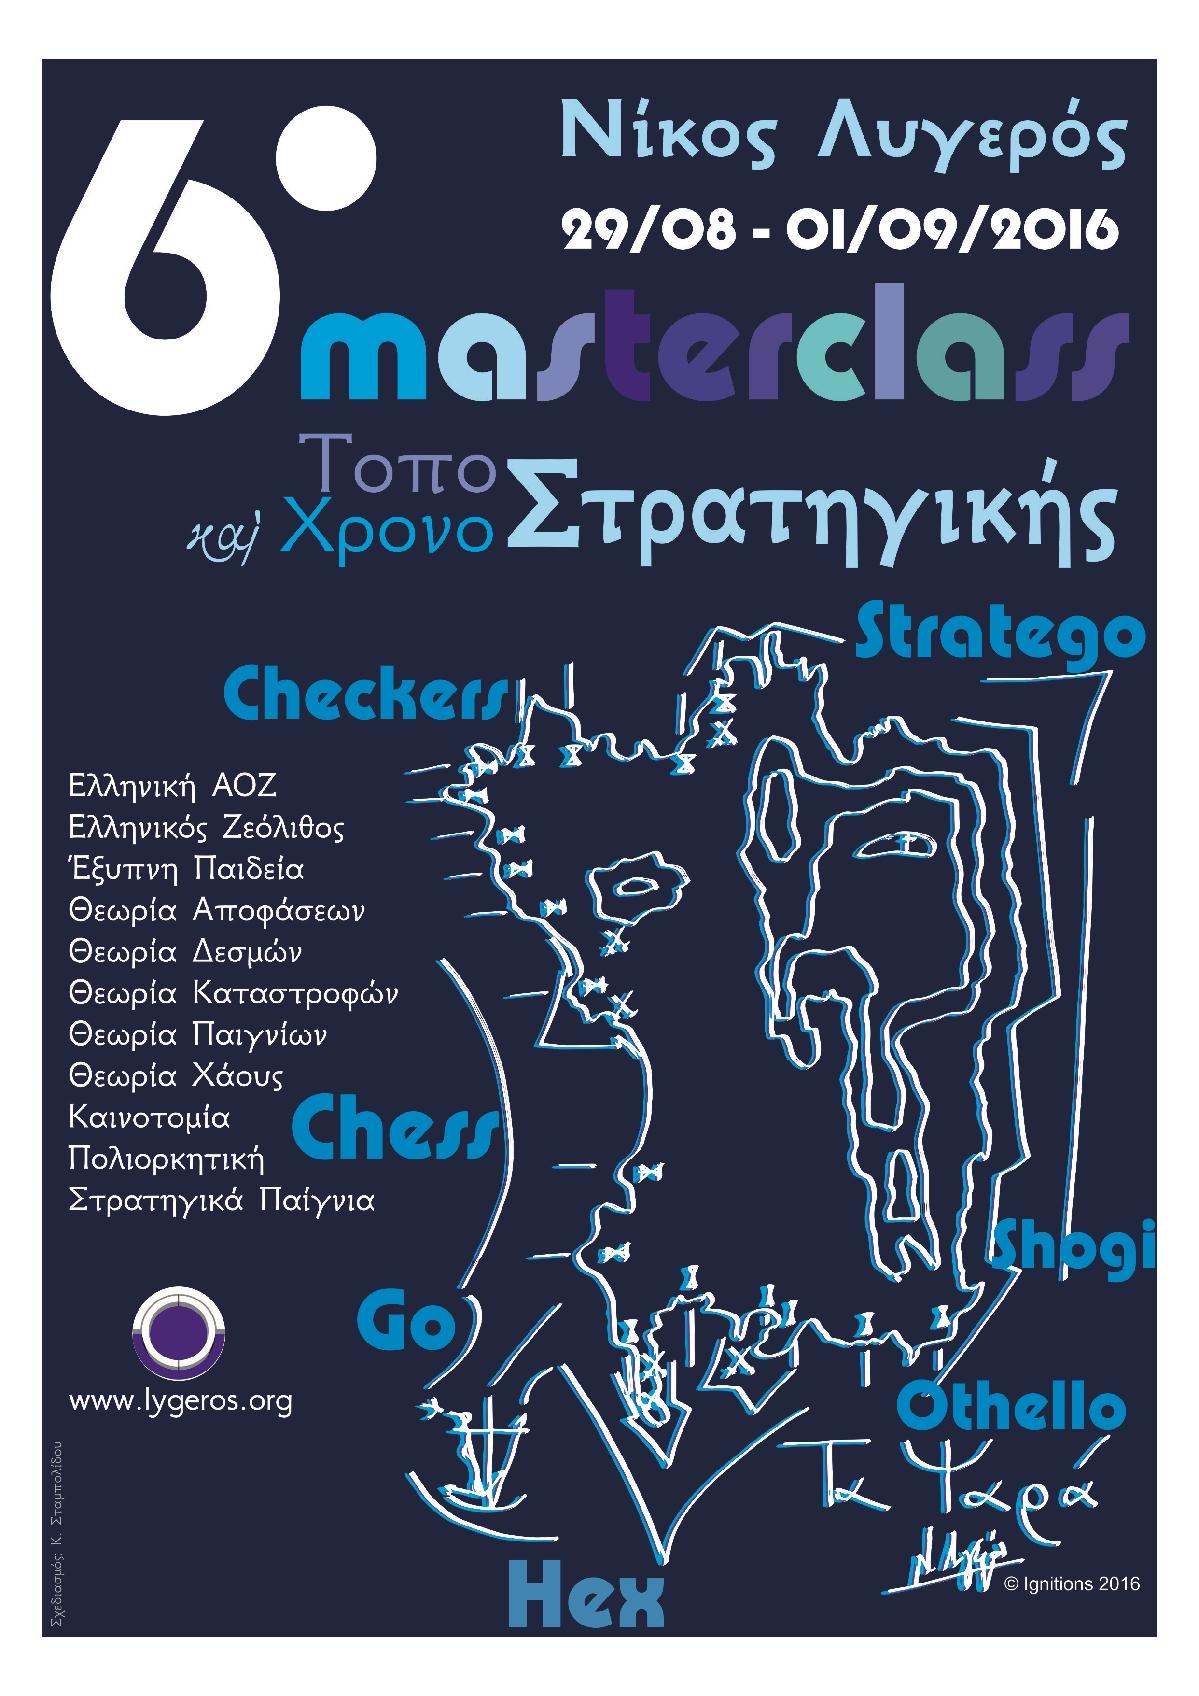 Masterclass: 6ο Masterclass Τοποστρατηγικής και Χρονοστρατηγικής